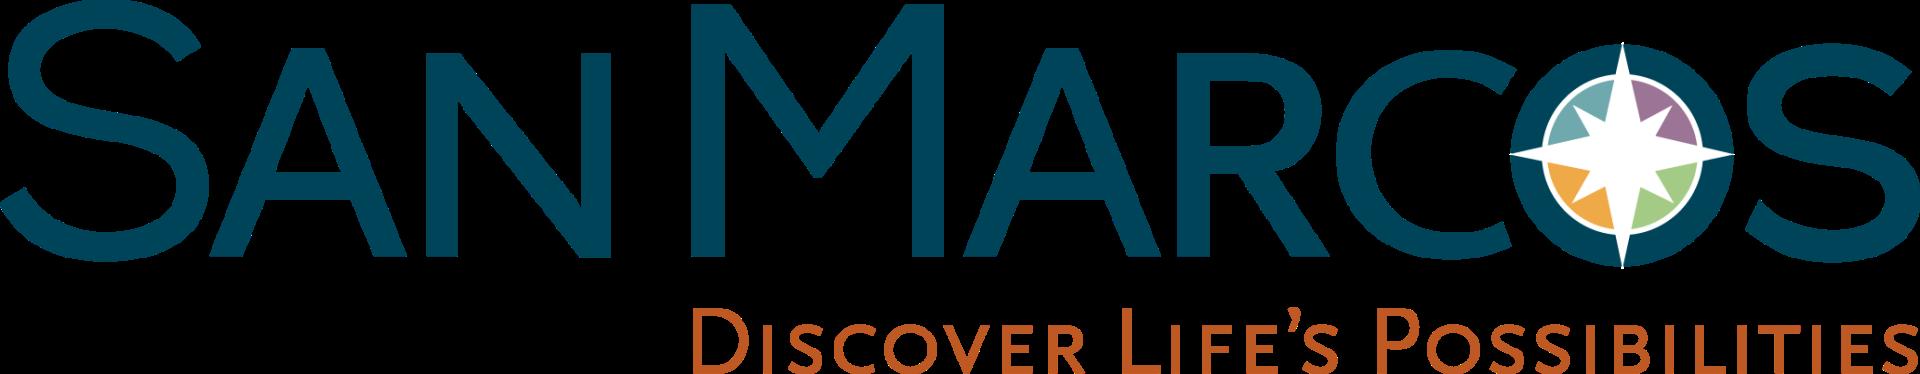 City unveils new logo | News | San Marcos, CA